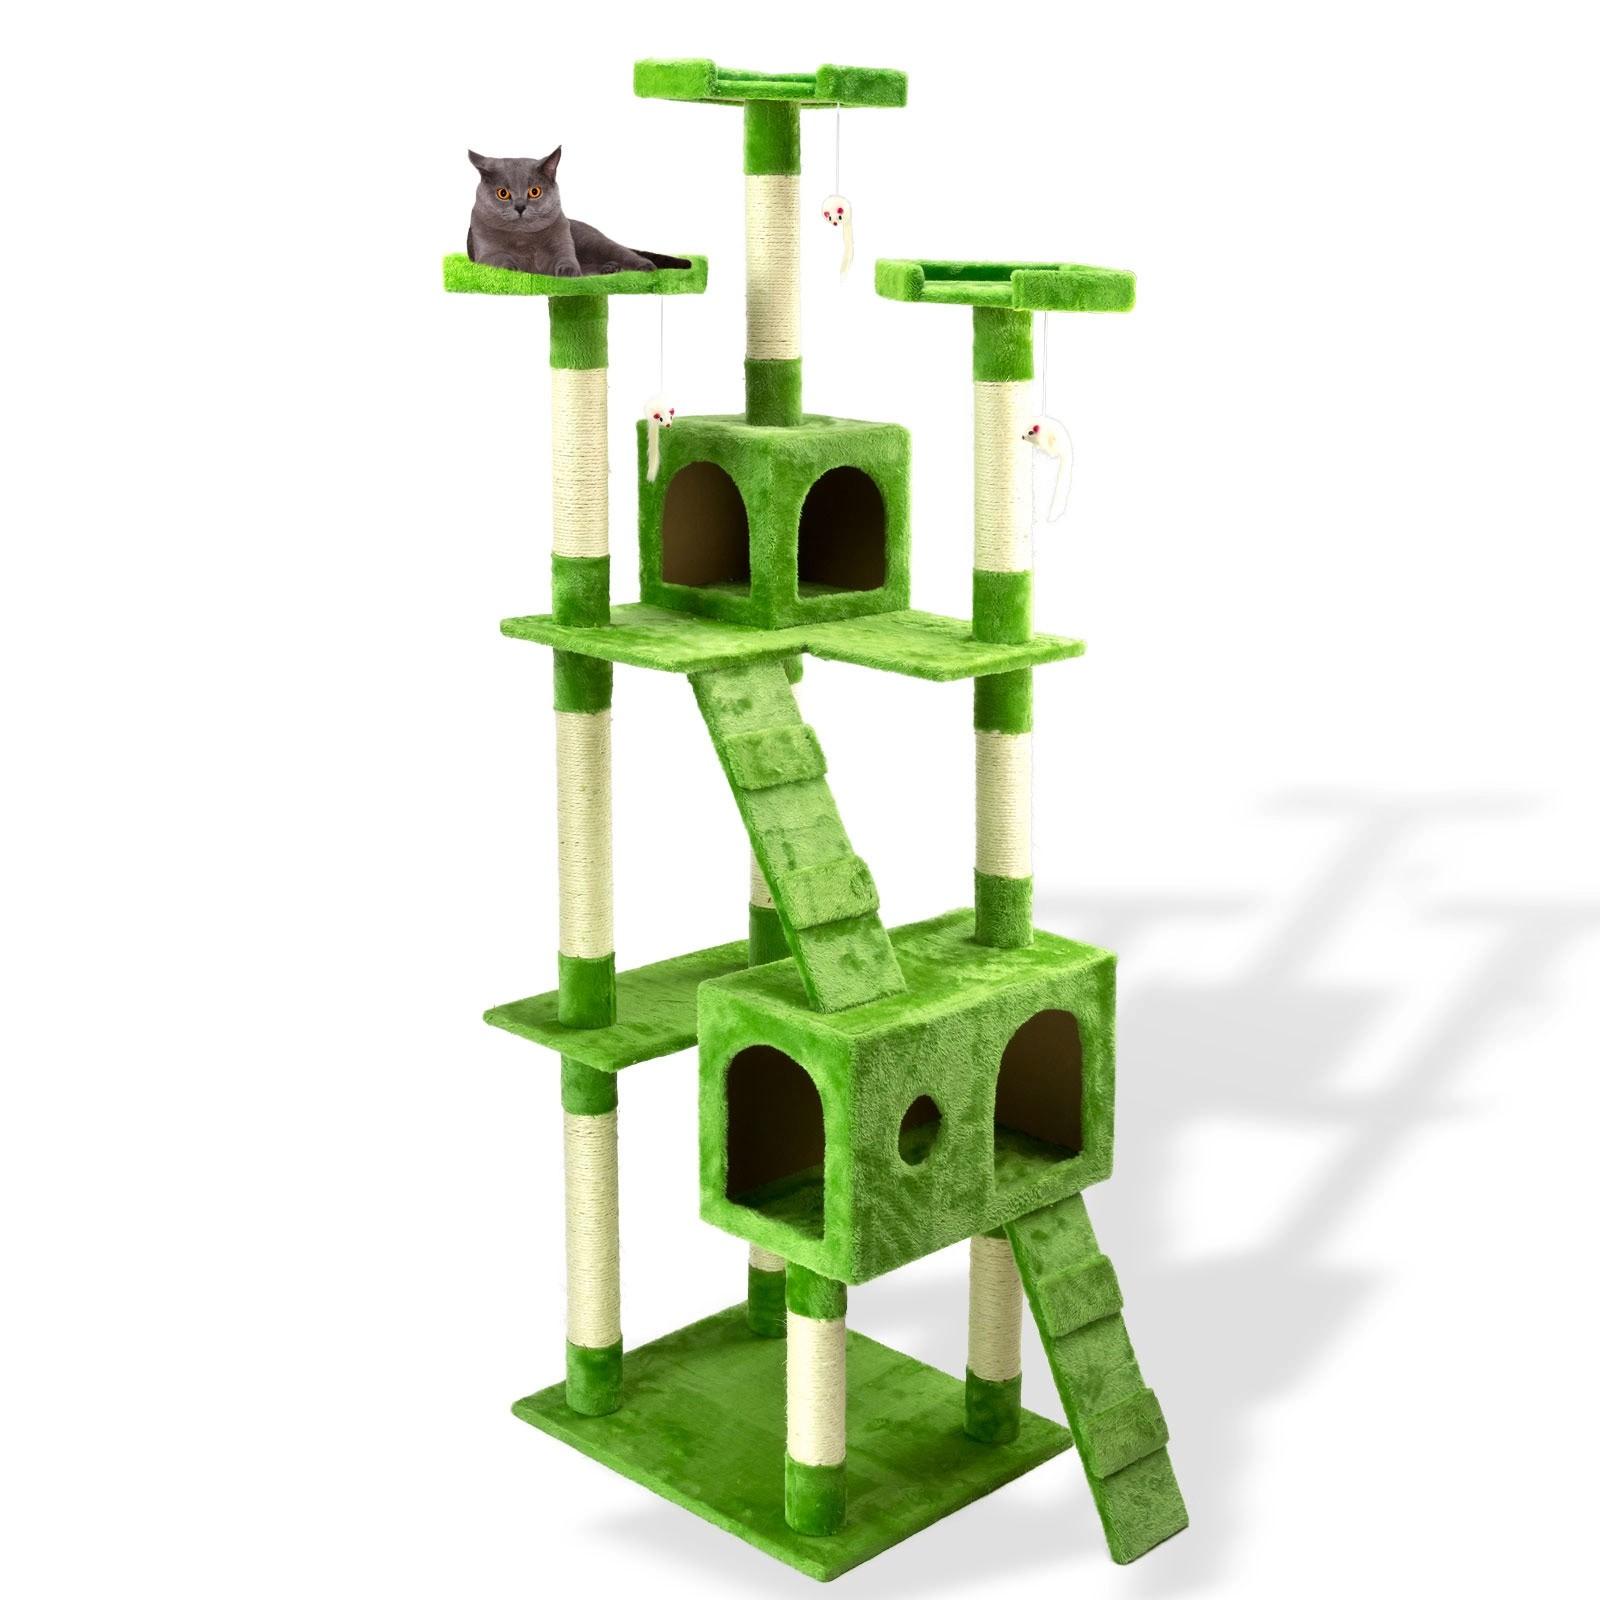 Katzen Kratzbaum / Katzenbaum Grün 180 cm